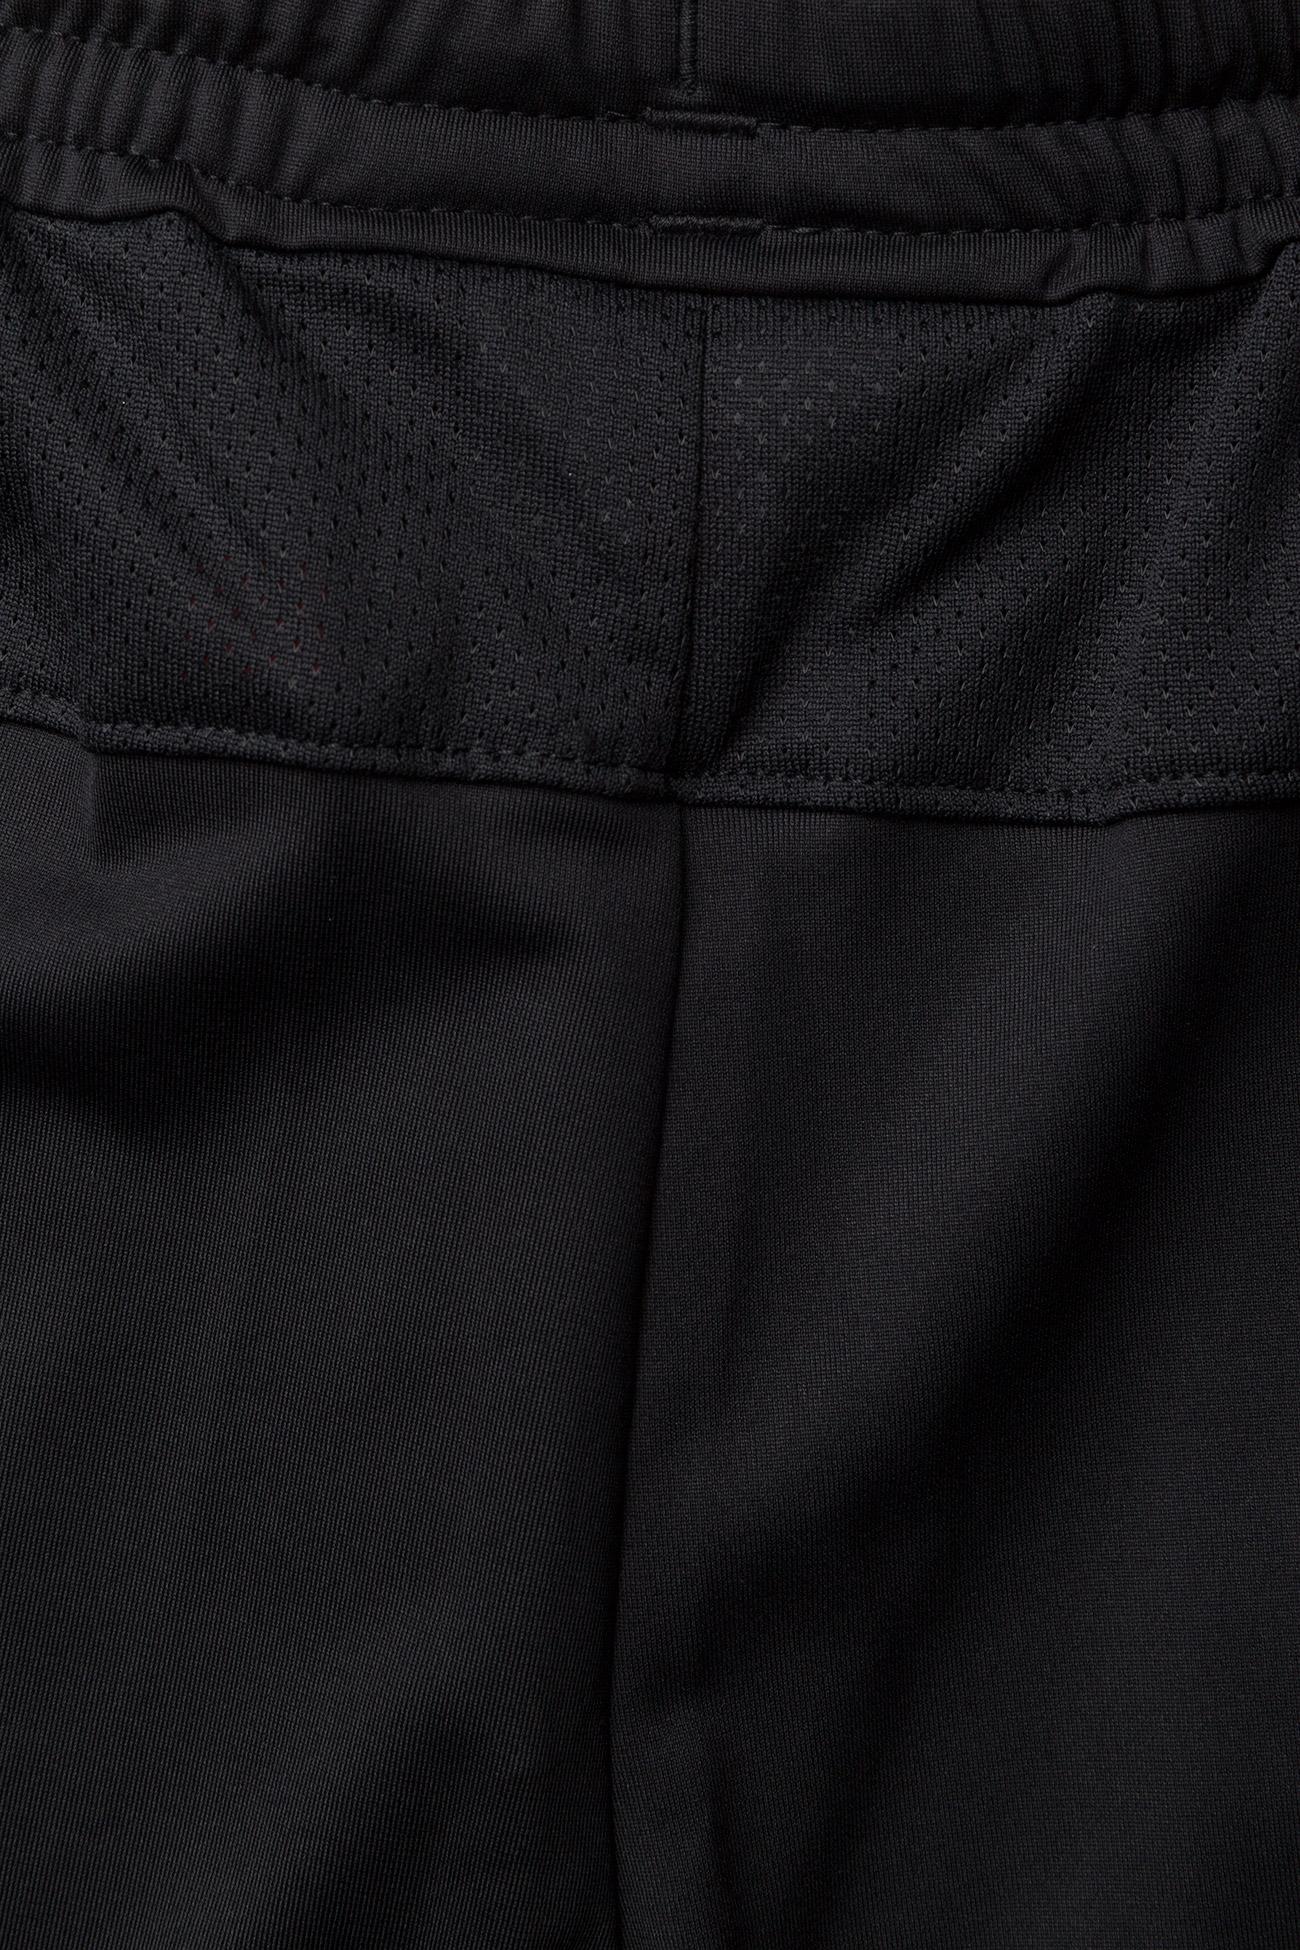 Under Armour Mk1 Short - Shorts Black